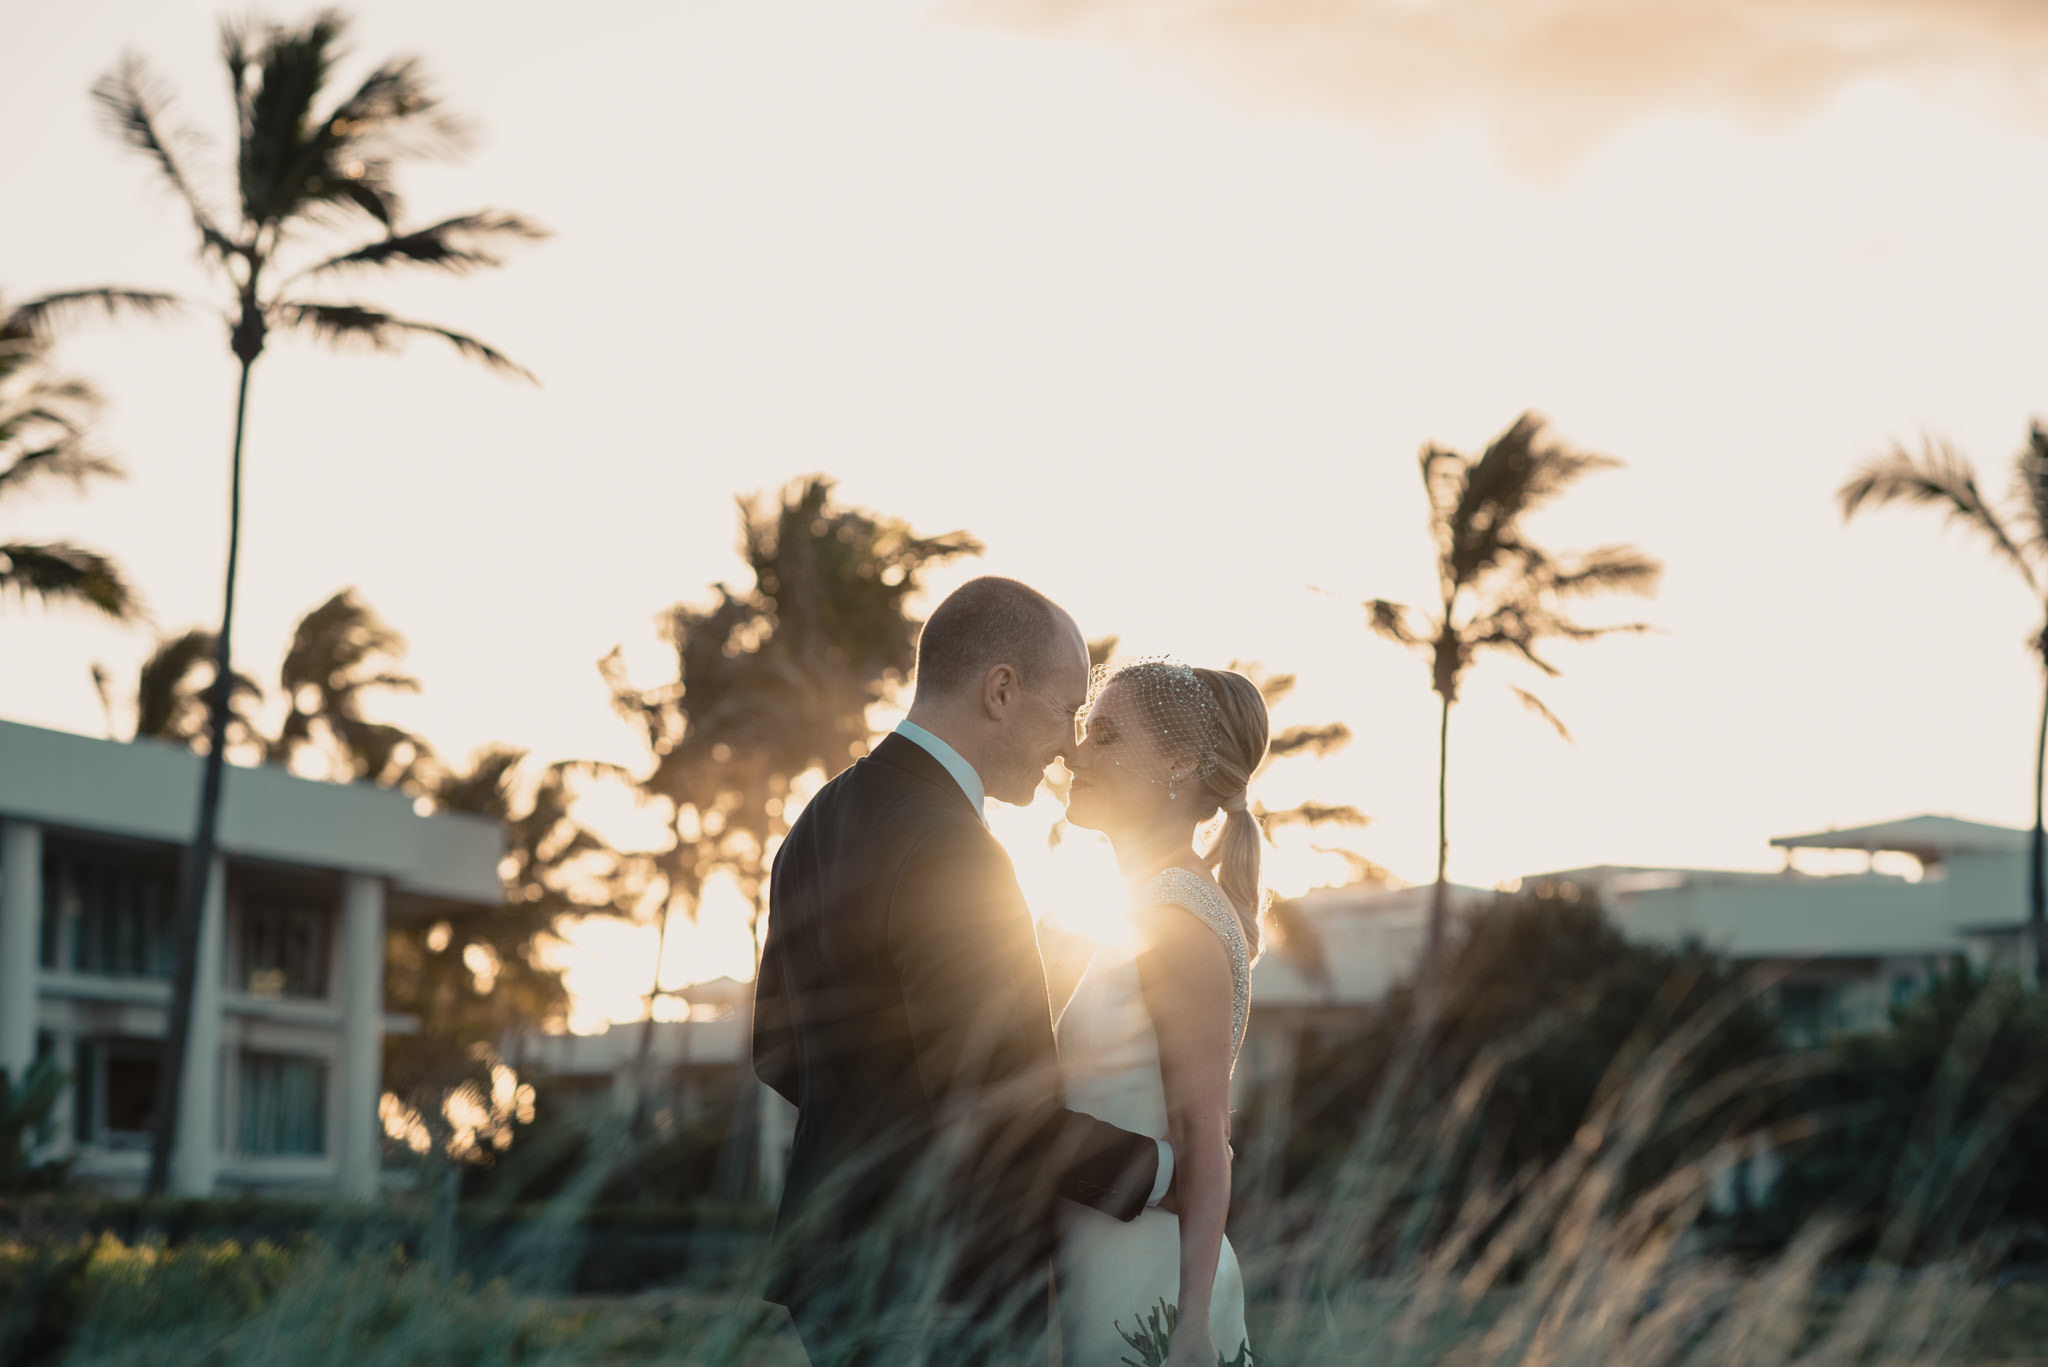 New-Black-Studios_Adam-Ward-Wedding-Photographer10.jpg